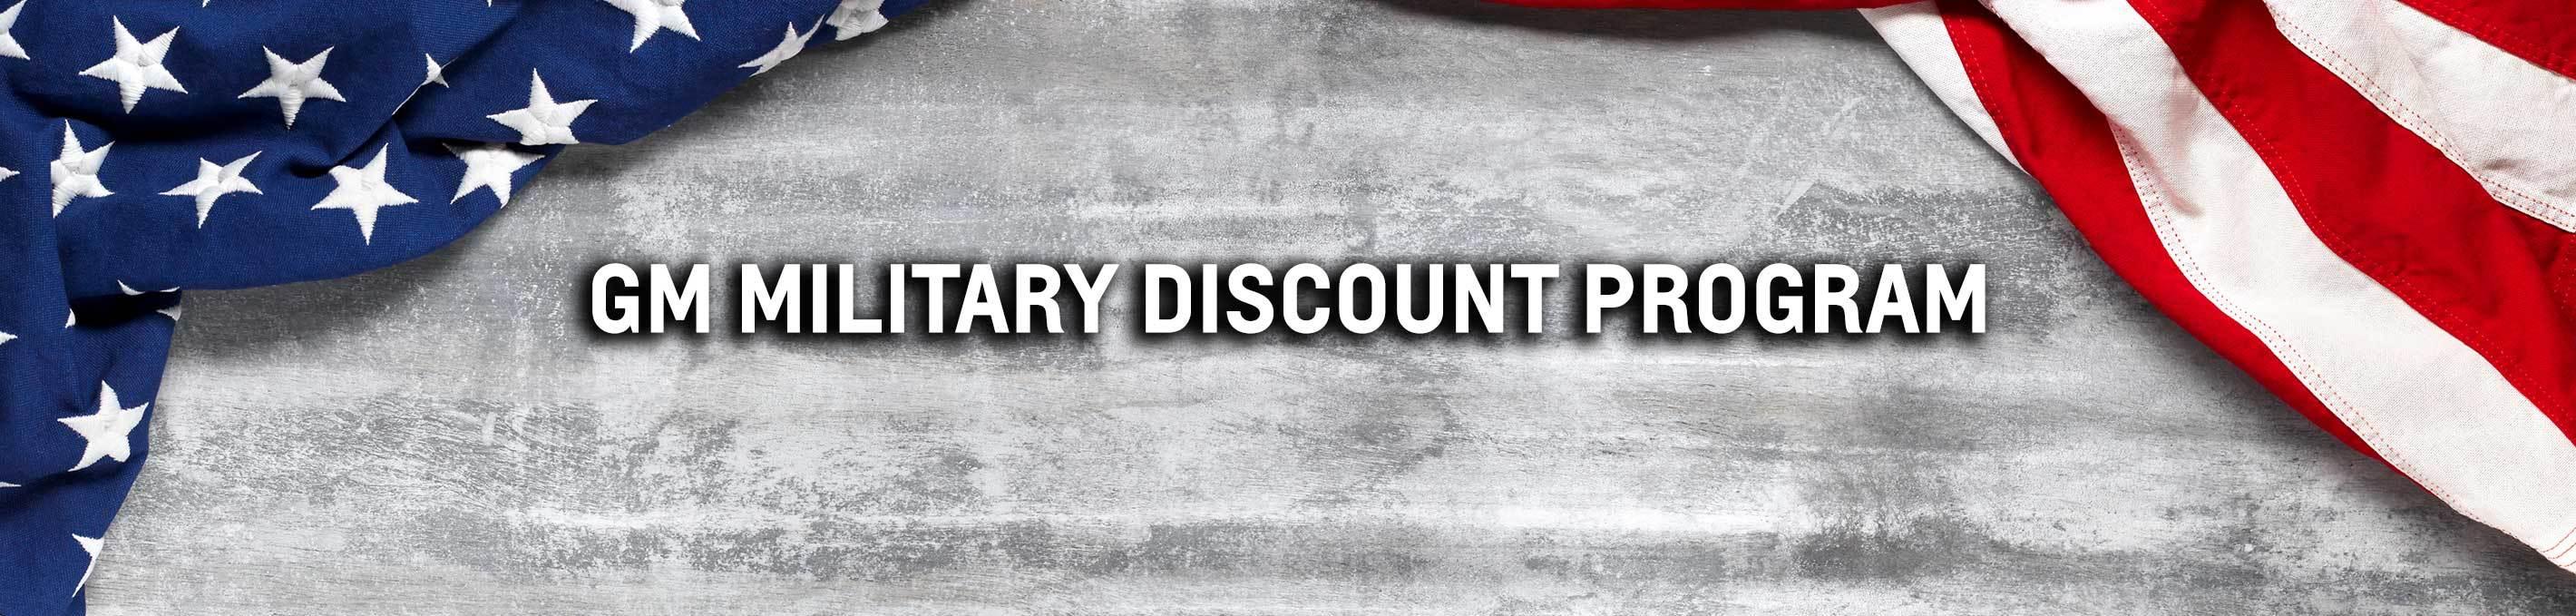 Pohanka Chevrolet GM Military Discount Program